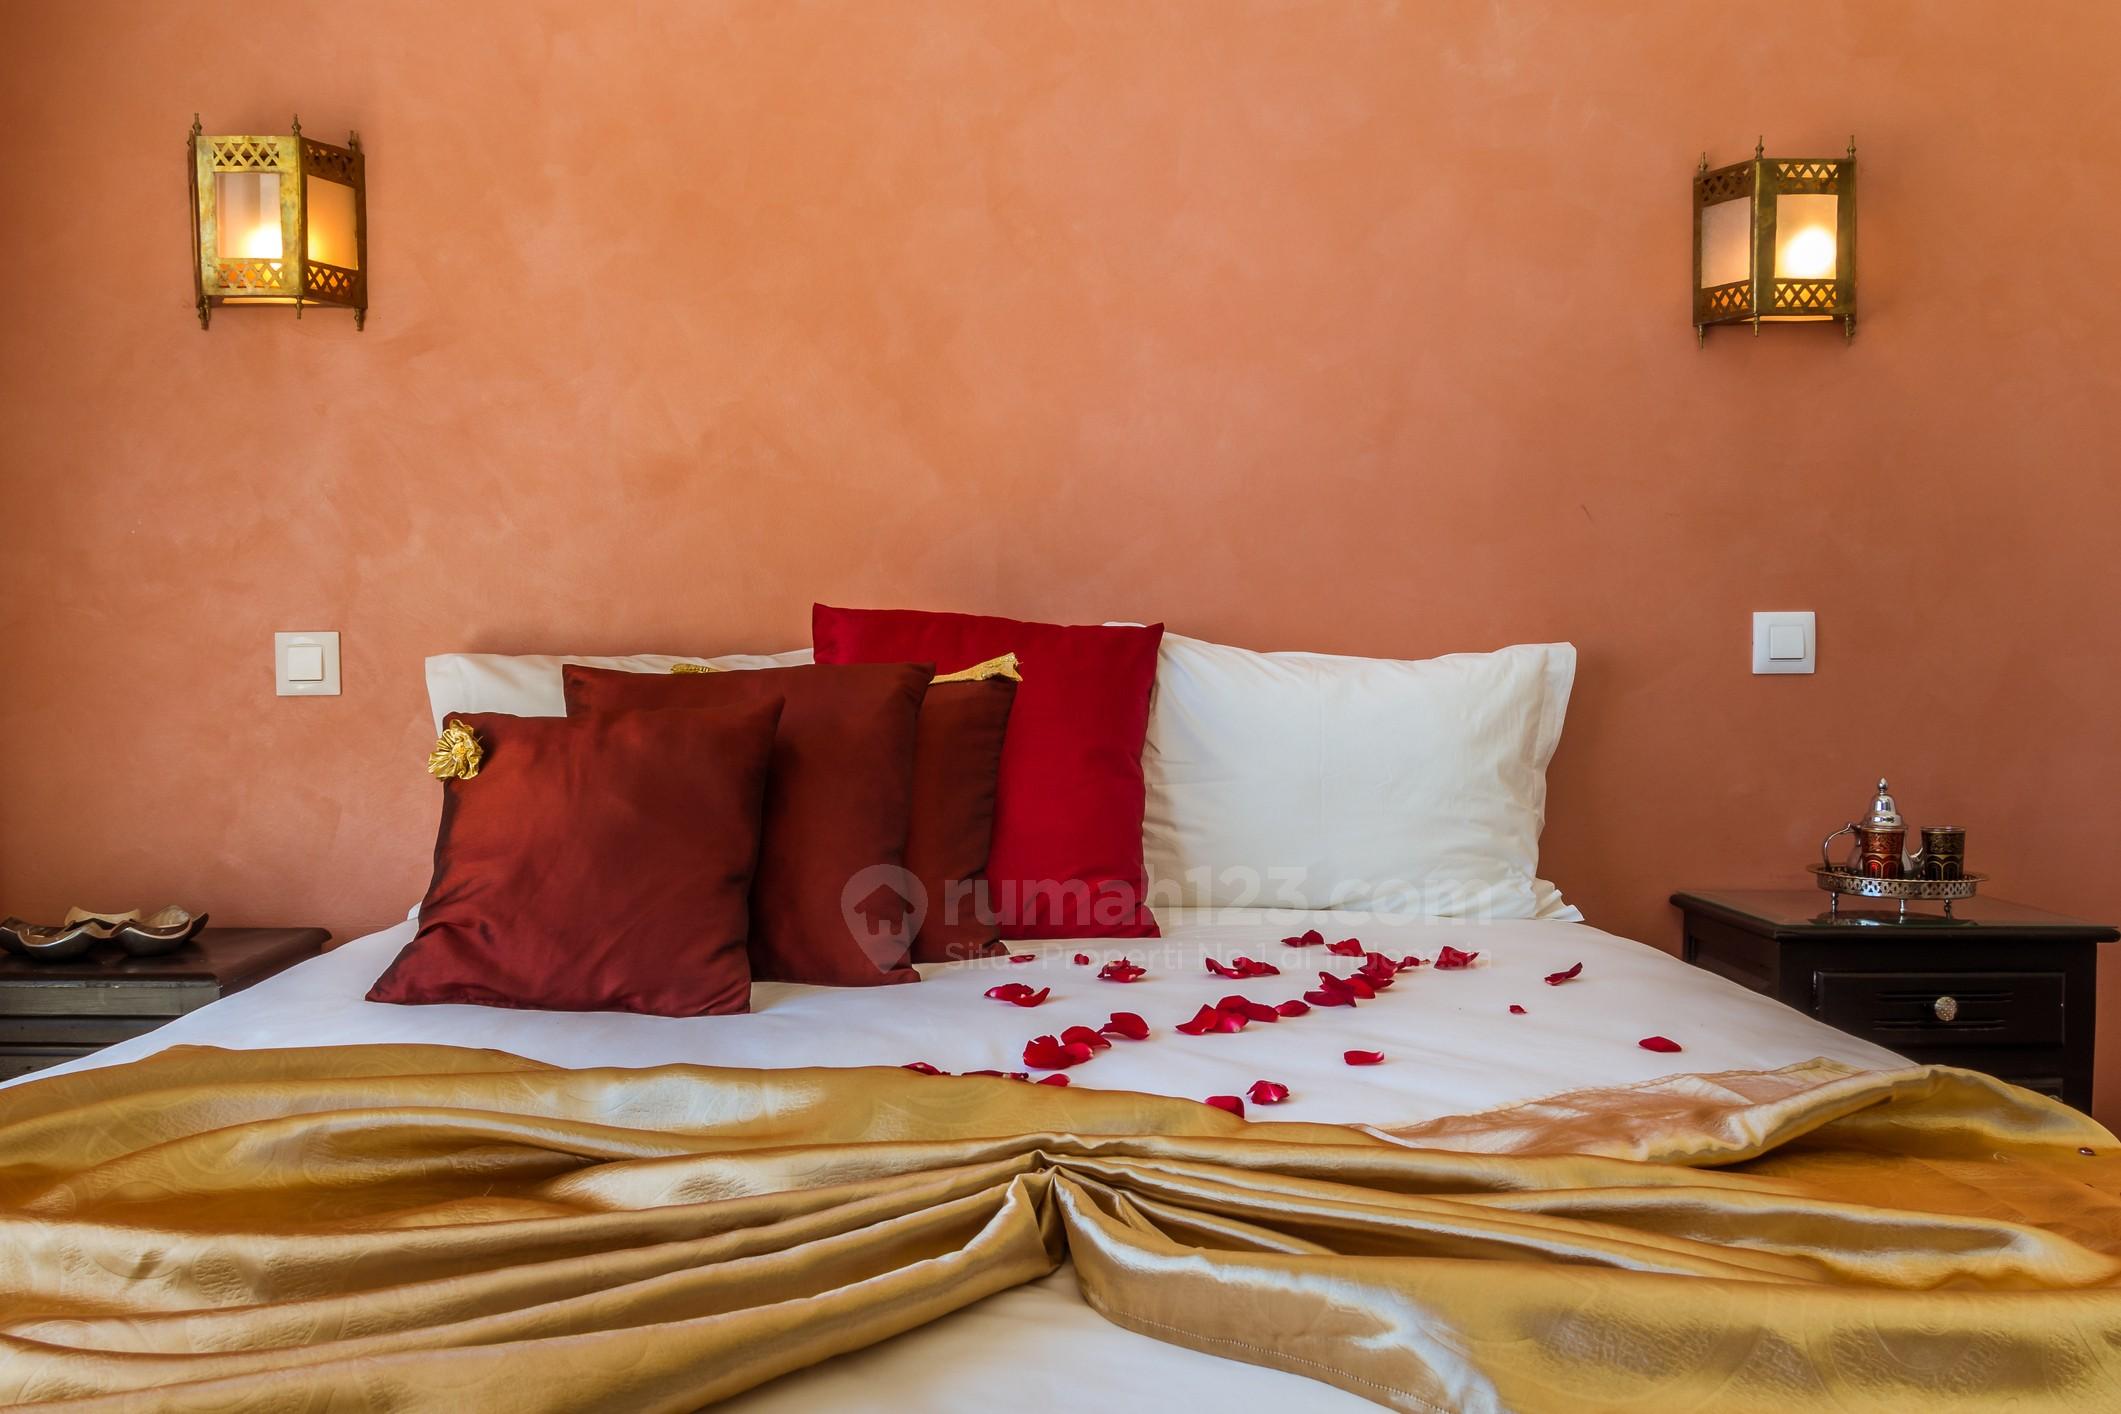 10 Gambar Kamar Tidur Minimalis Yang Bikin Pasangan Baru